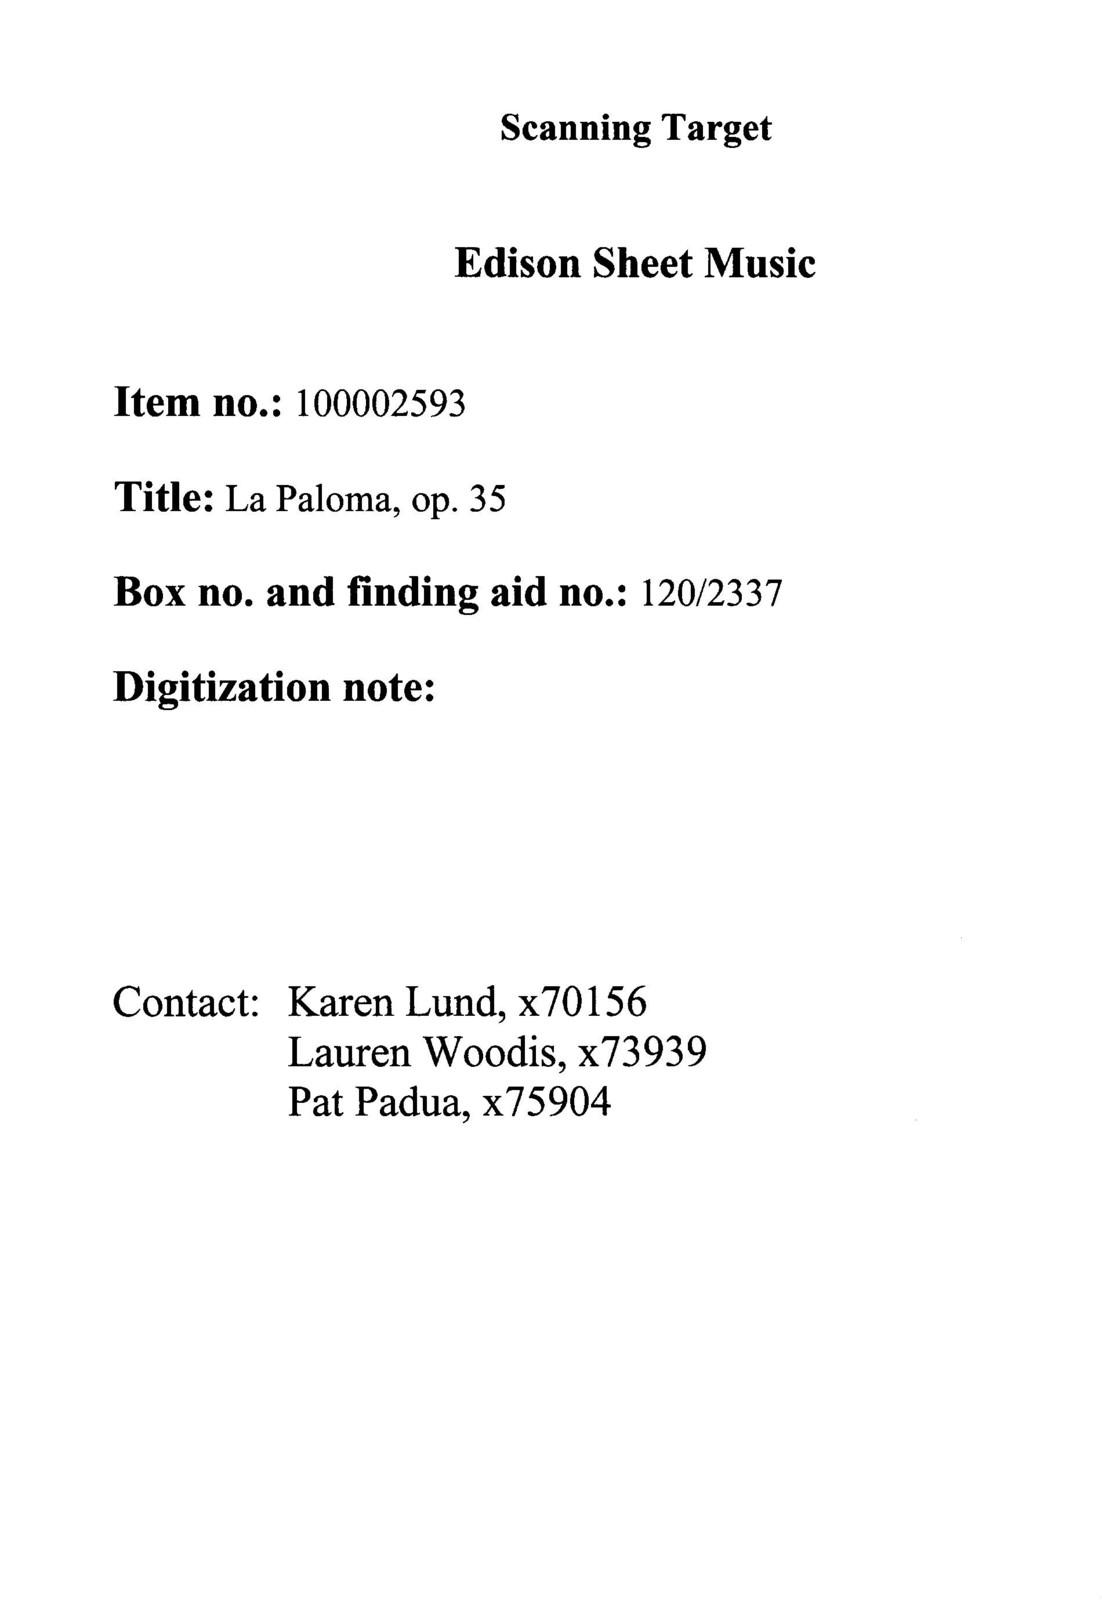 La  Paloma, op. 35